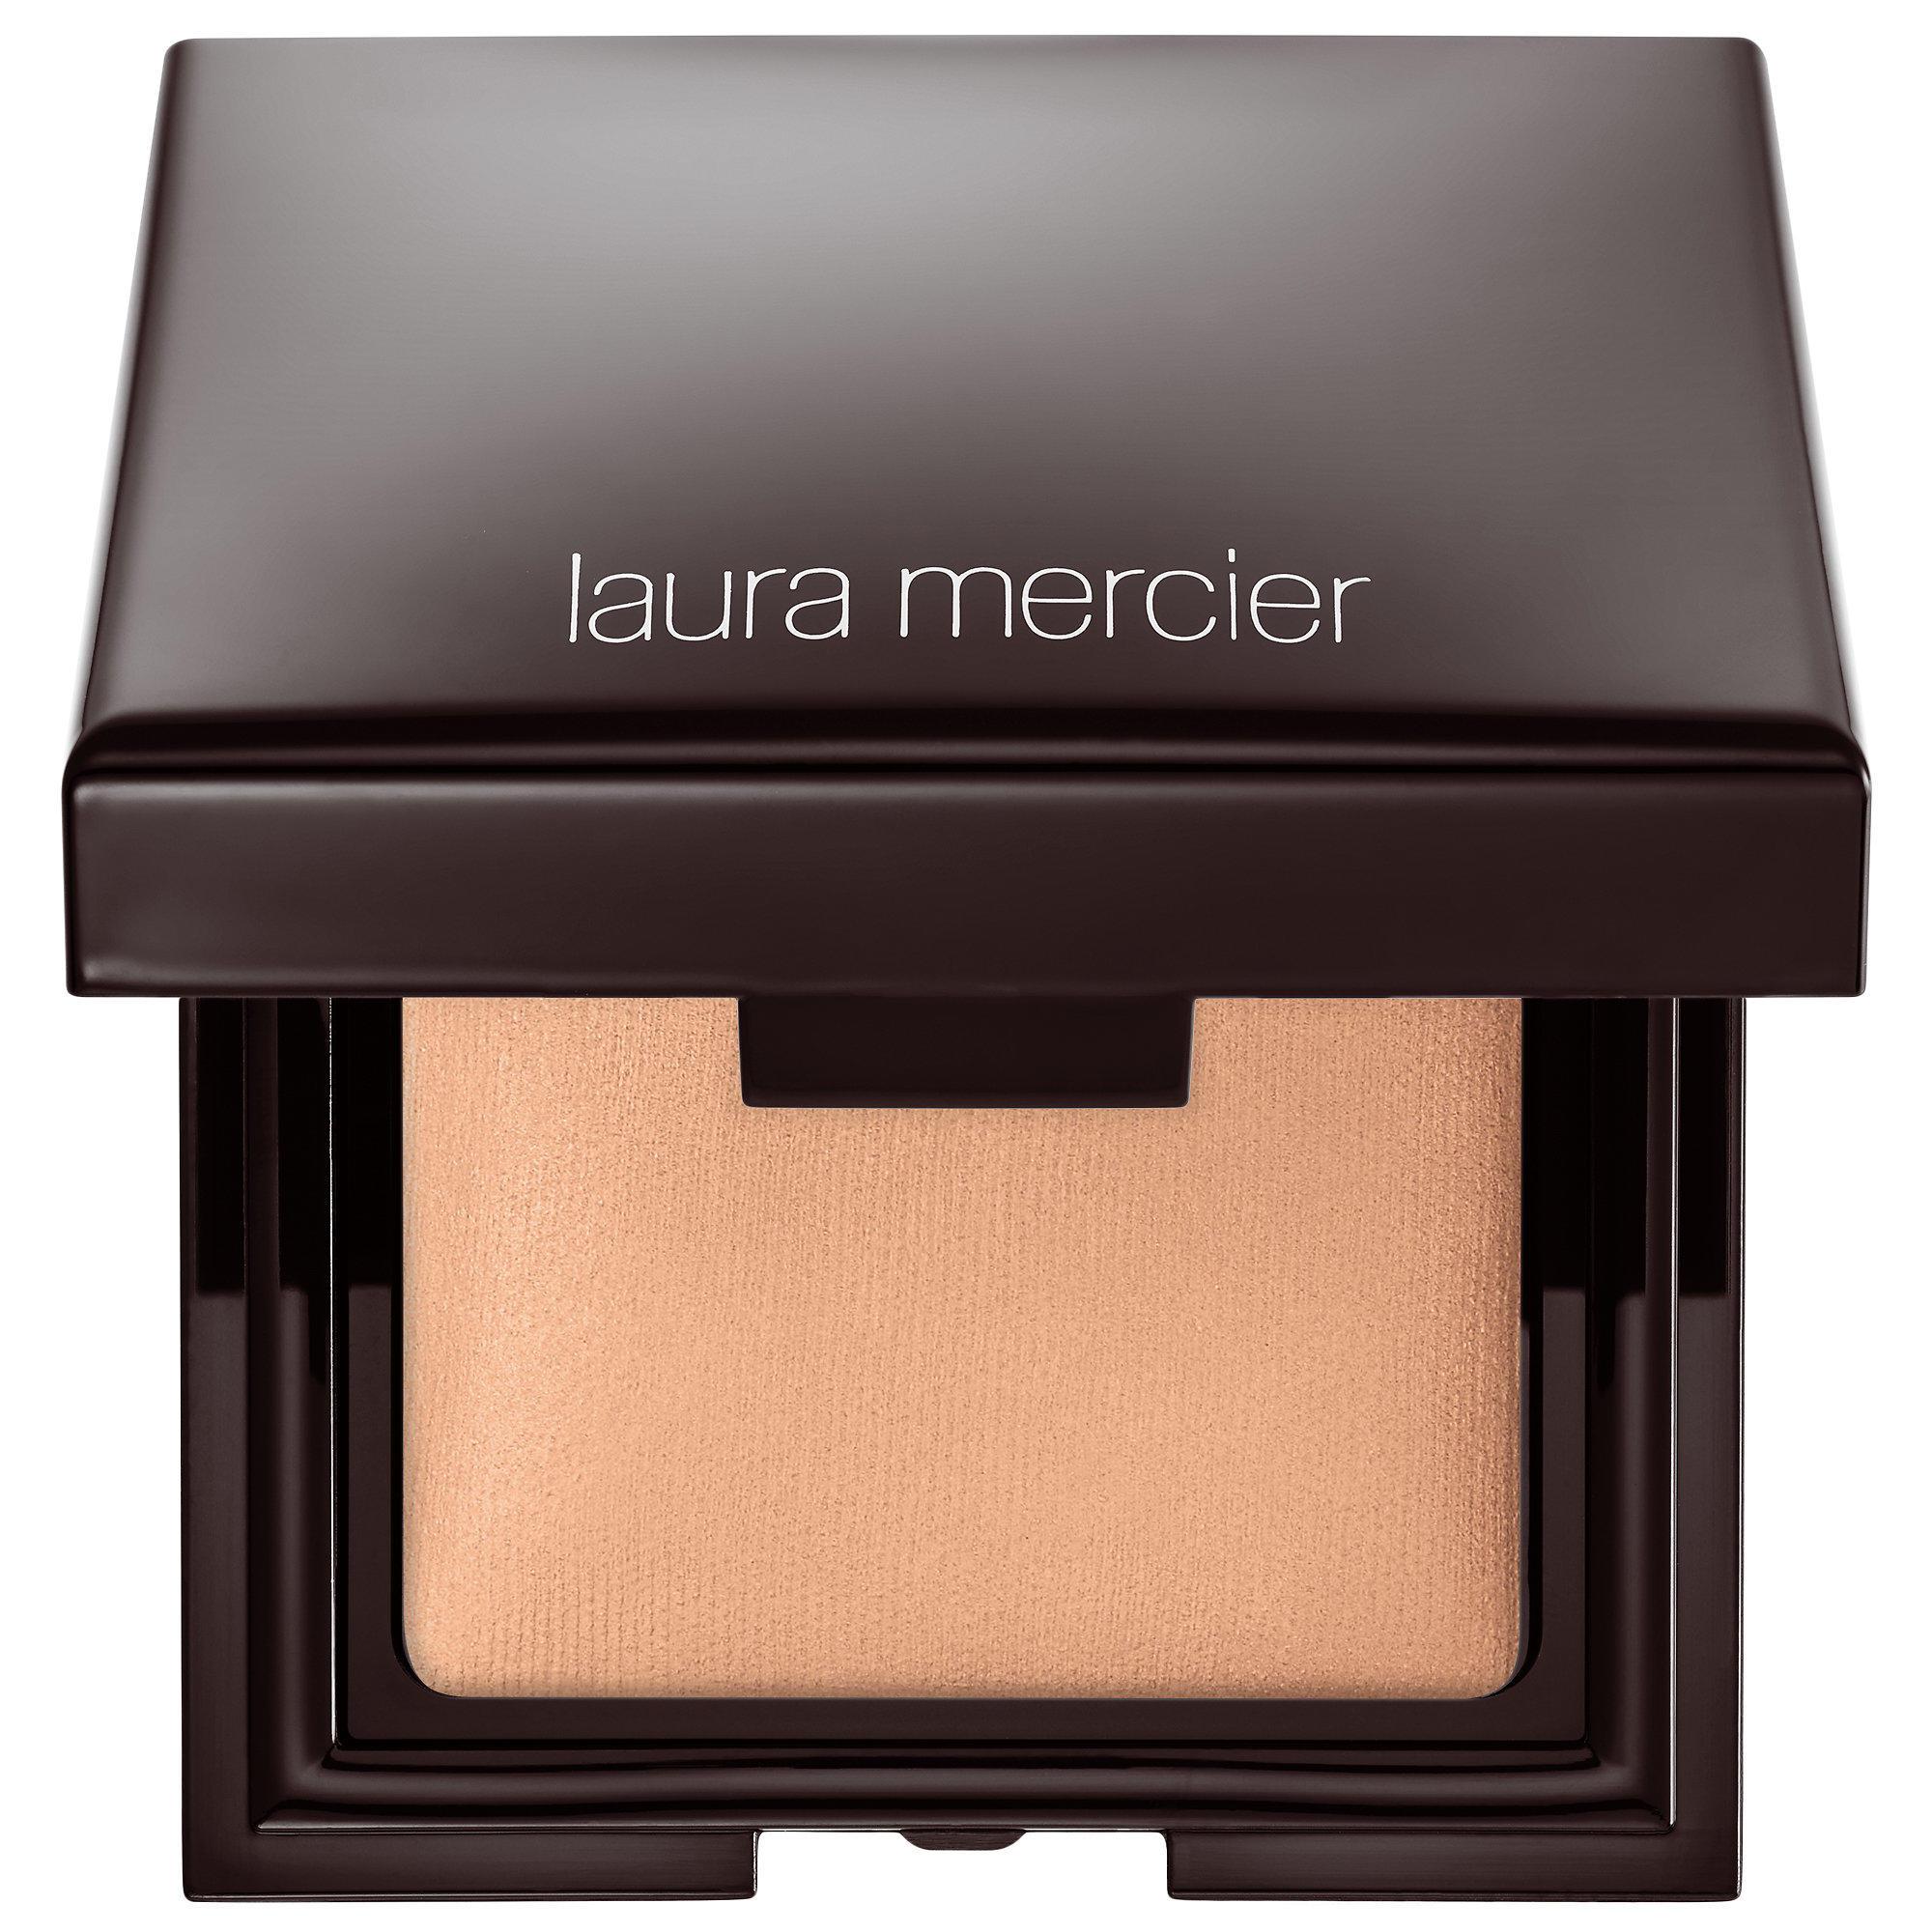 Laura Mercier Candleglow Sheer Perfecting Powder Light 2